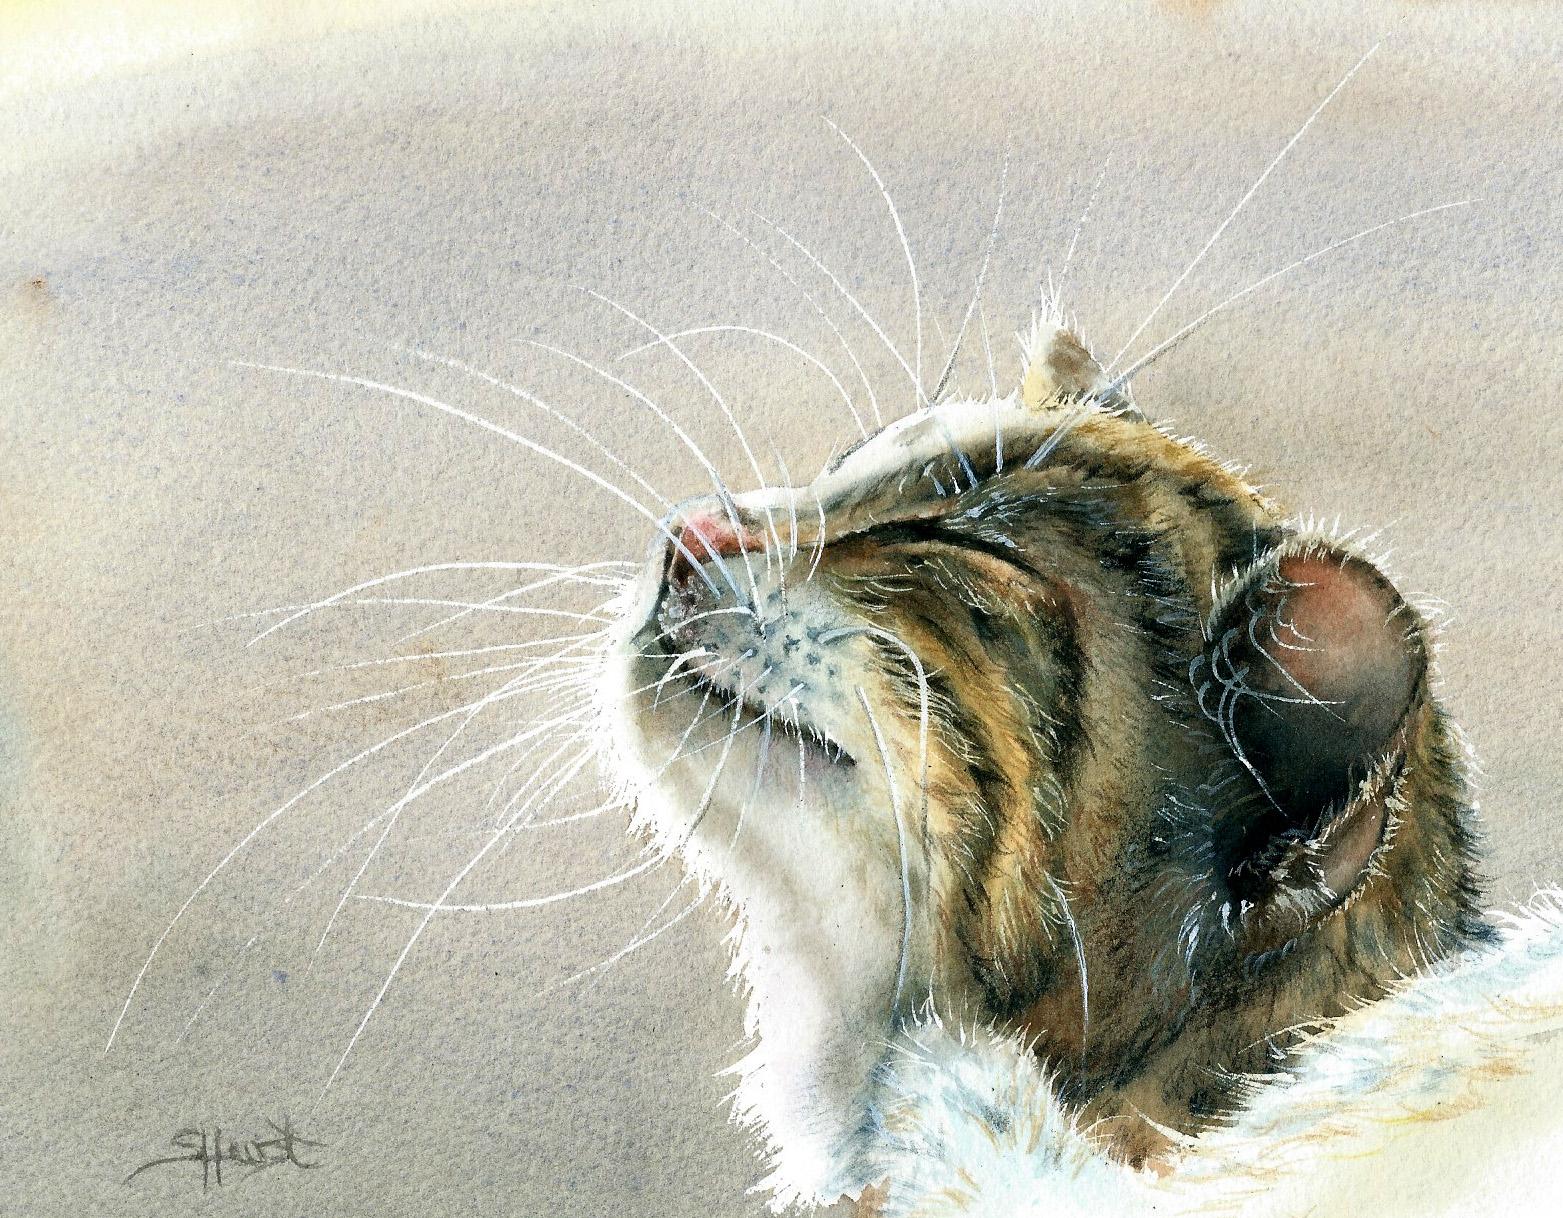 Sharon Hurst, Purring In The Sunshine, Watercolour and pencil, 15.63x12.18,  http://www.sharonhurst.co.uk/